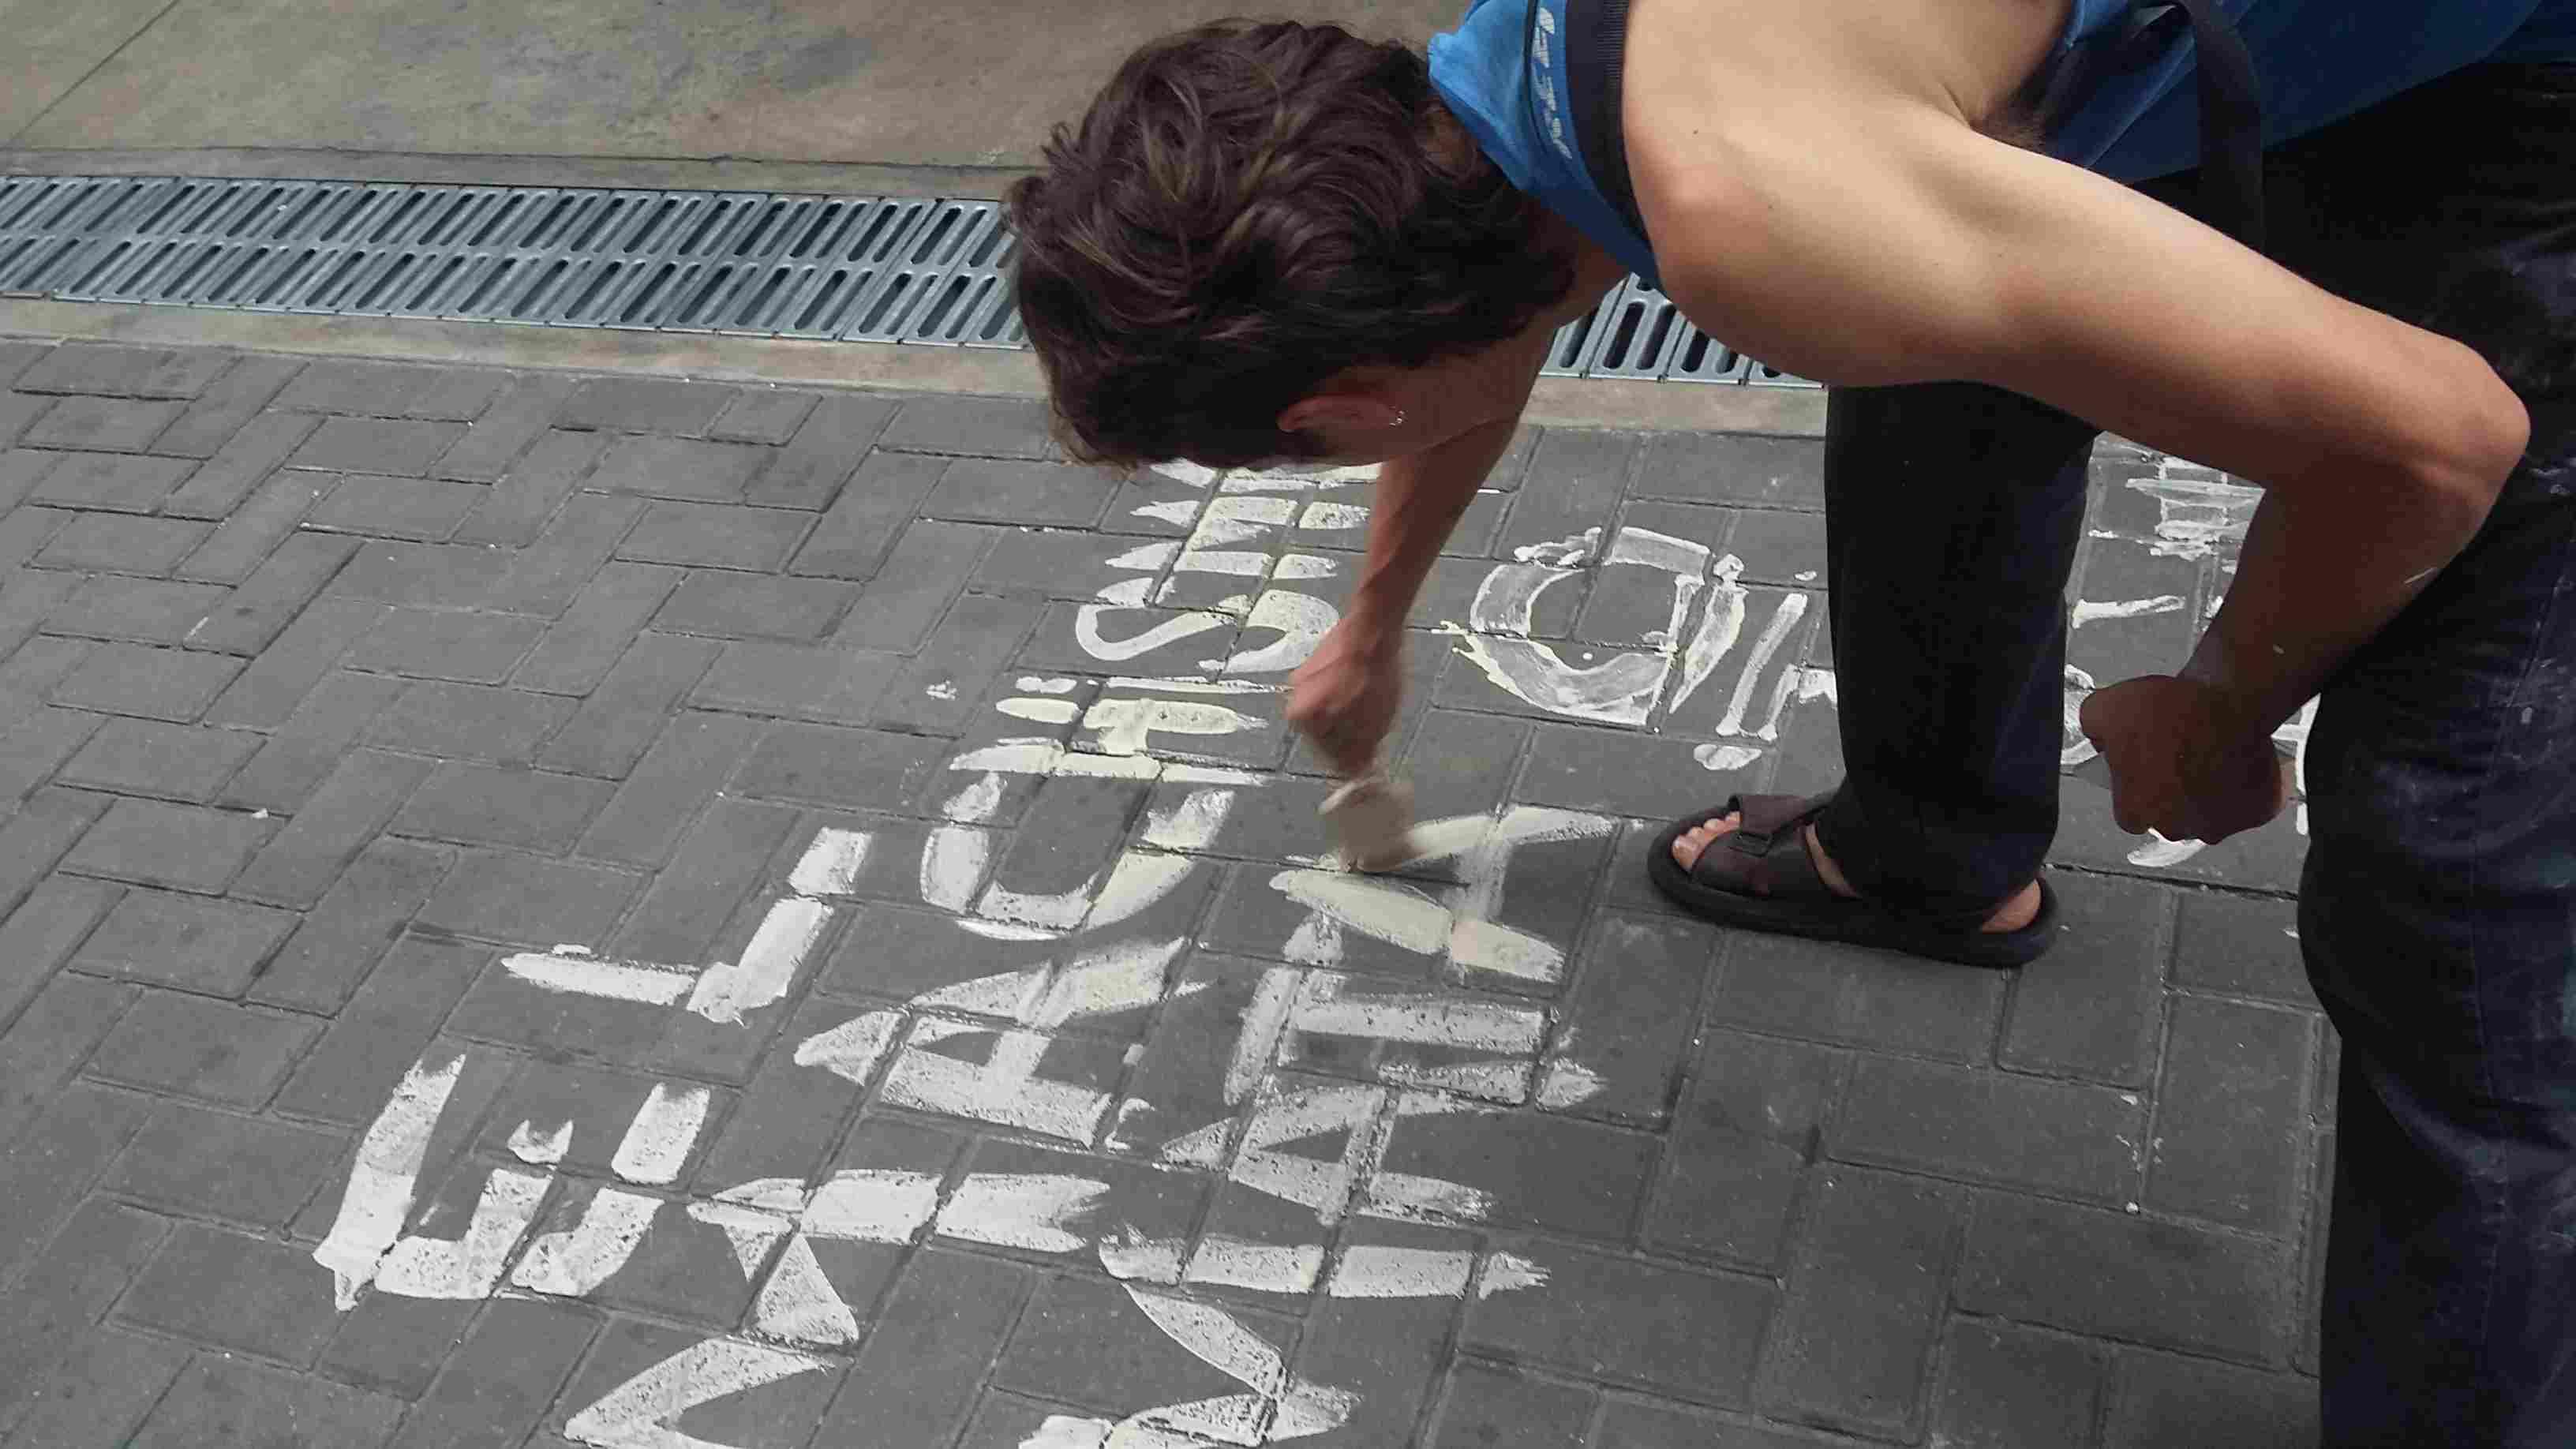 Muchacho escribiendo un grafitti contra el machismo.